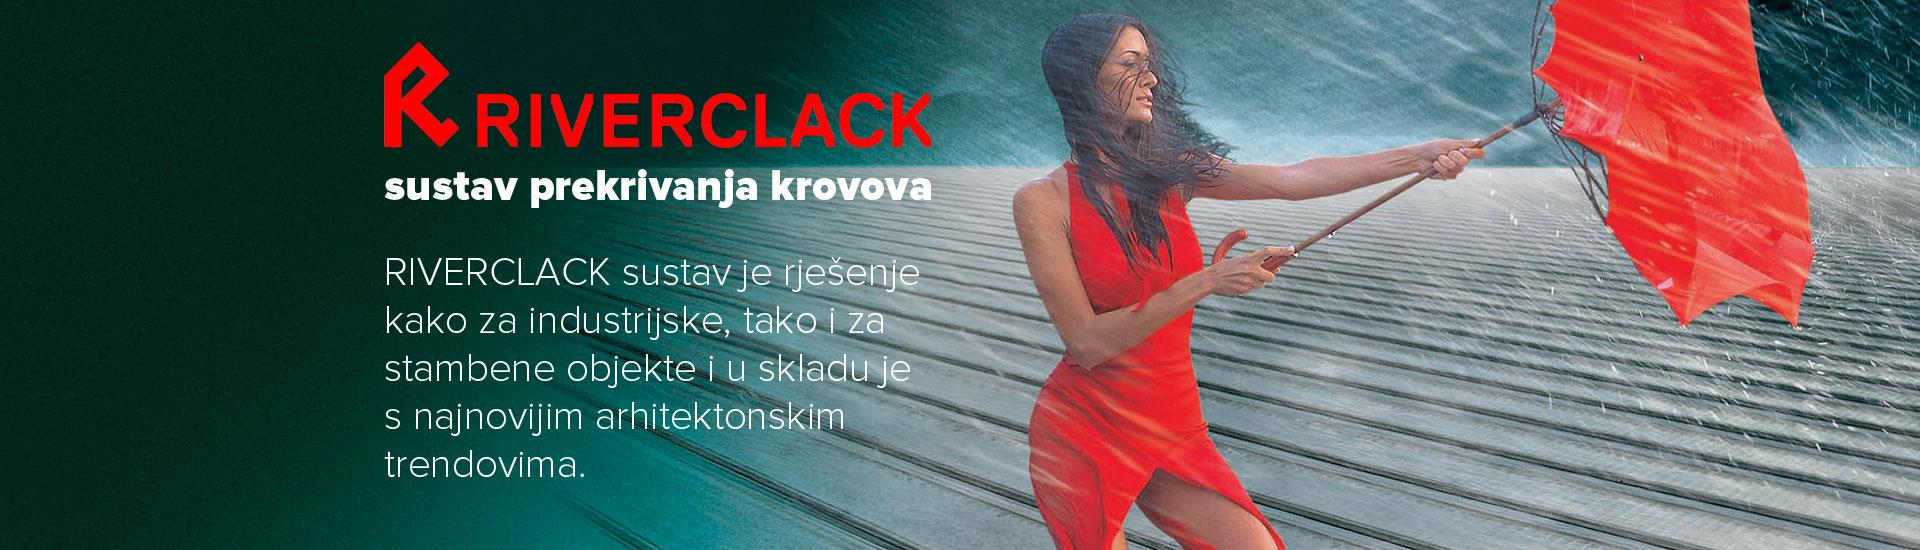 http://www.legolim.hr/Repository/Banners/riverclack-sustav-prekrivanja-krovova-banner-2016.jpg